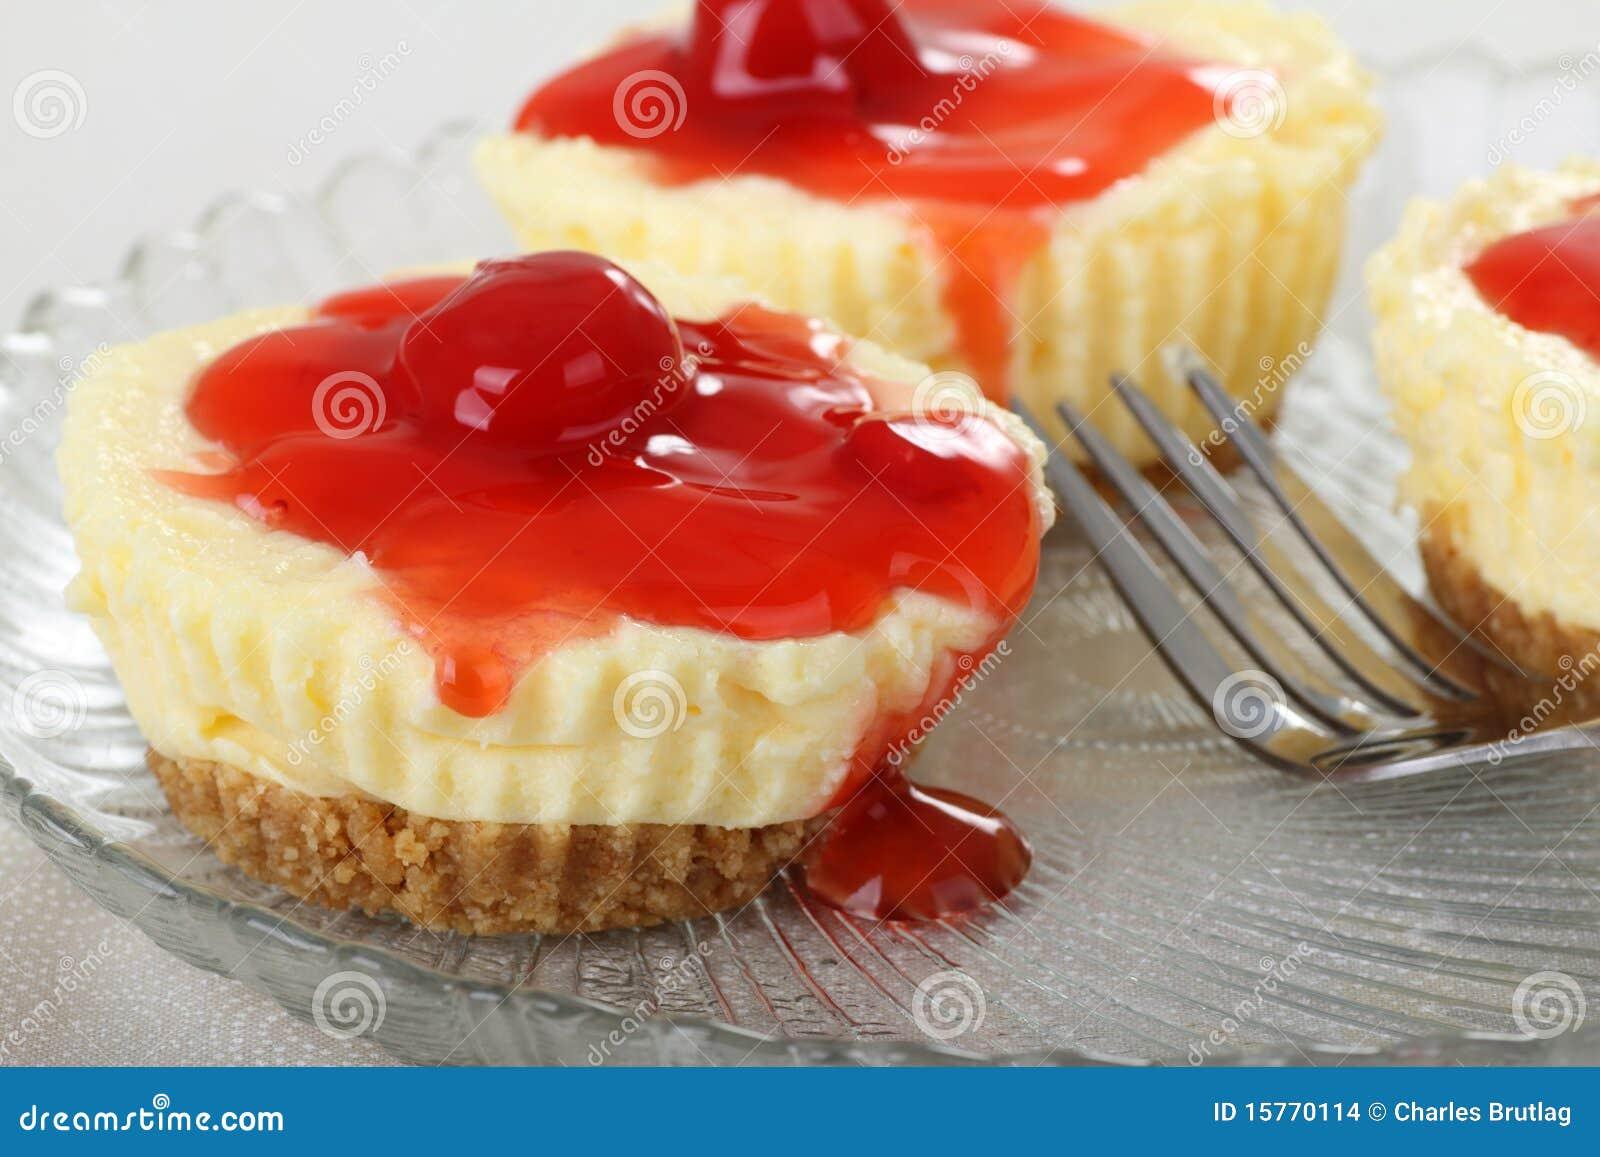 cheesecake cupcakes recipe cheesecake cupcakes cheesecake cupcakes ...